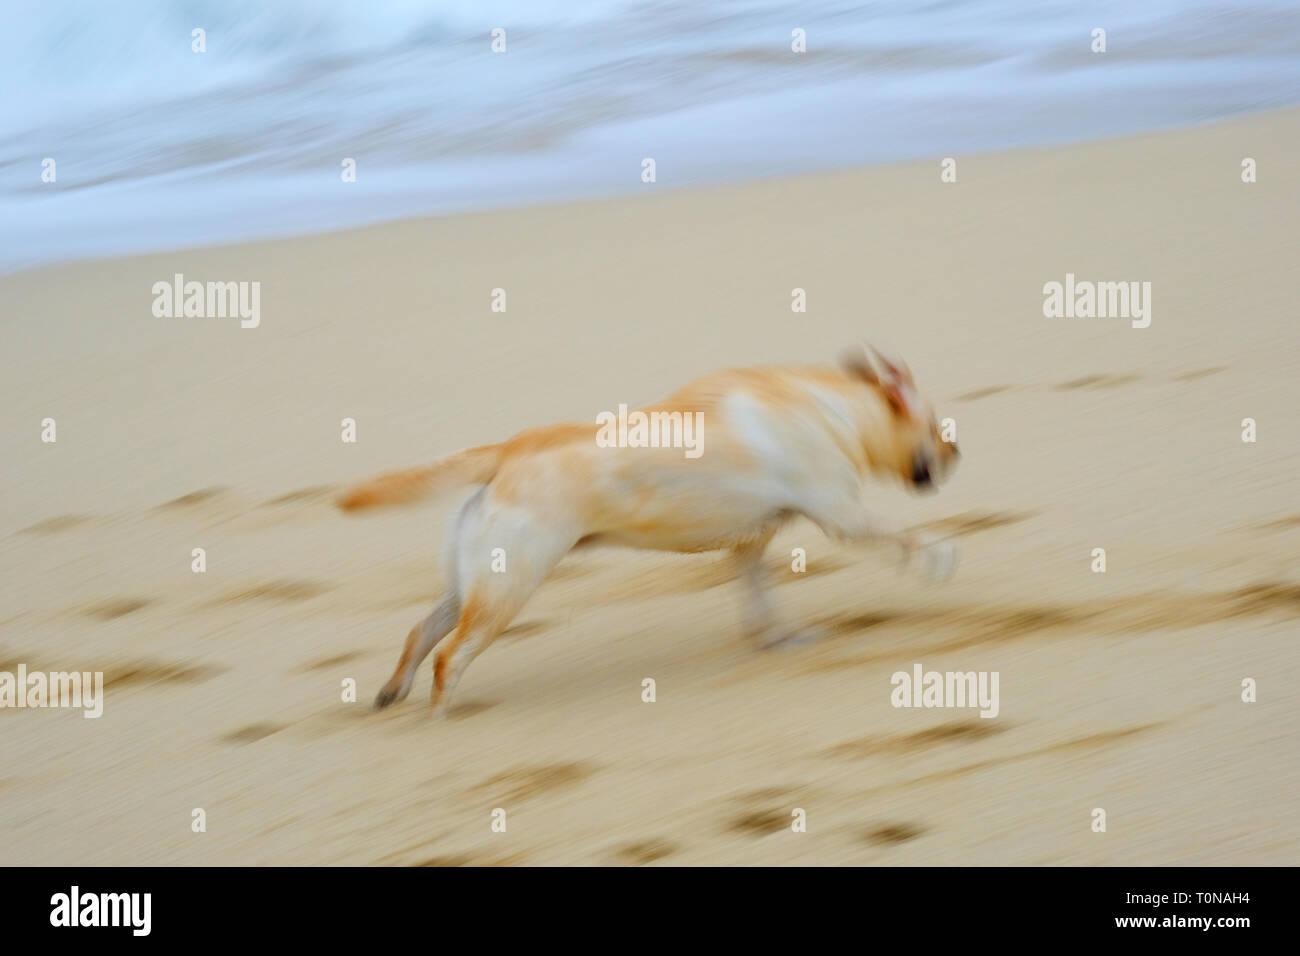 Blurred image of a labrador retriever running across a sandy beach - John Gollop - Stock Image